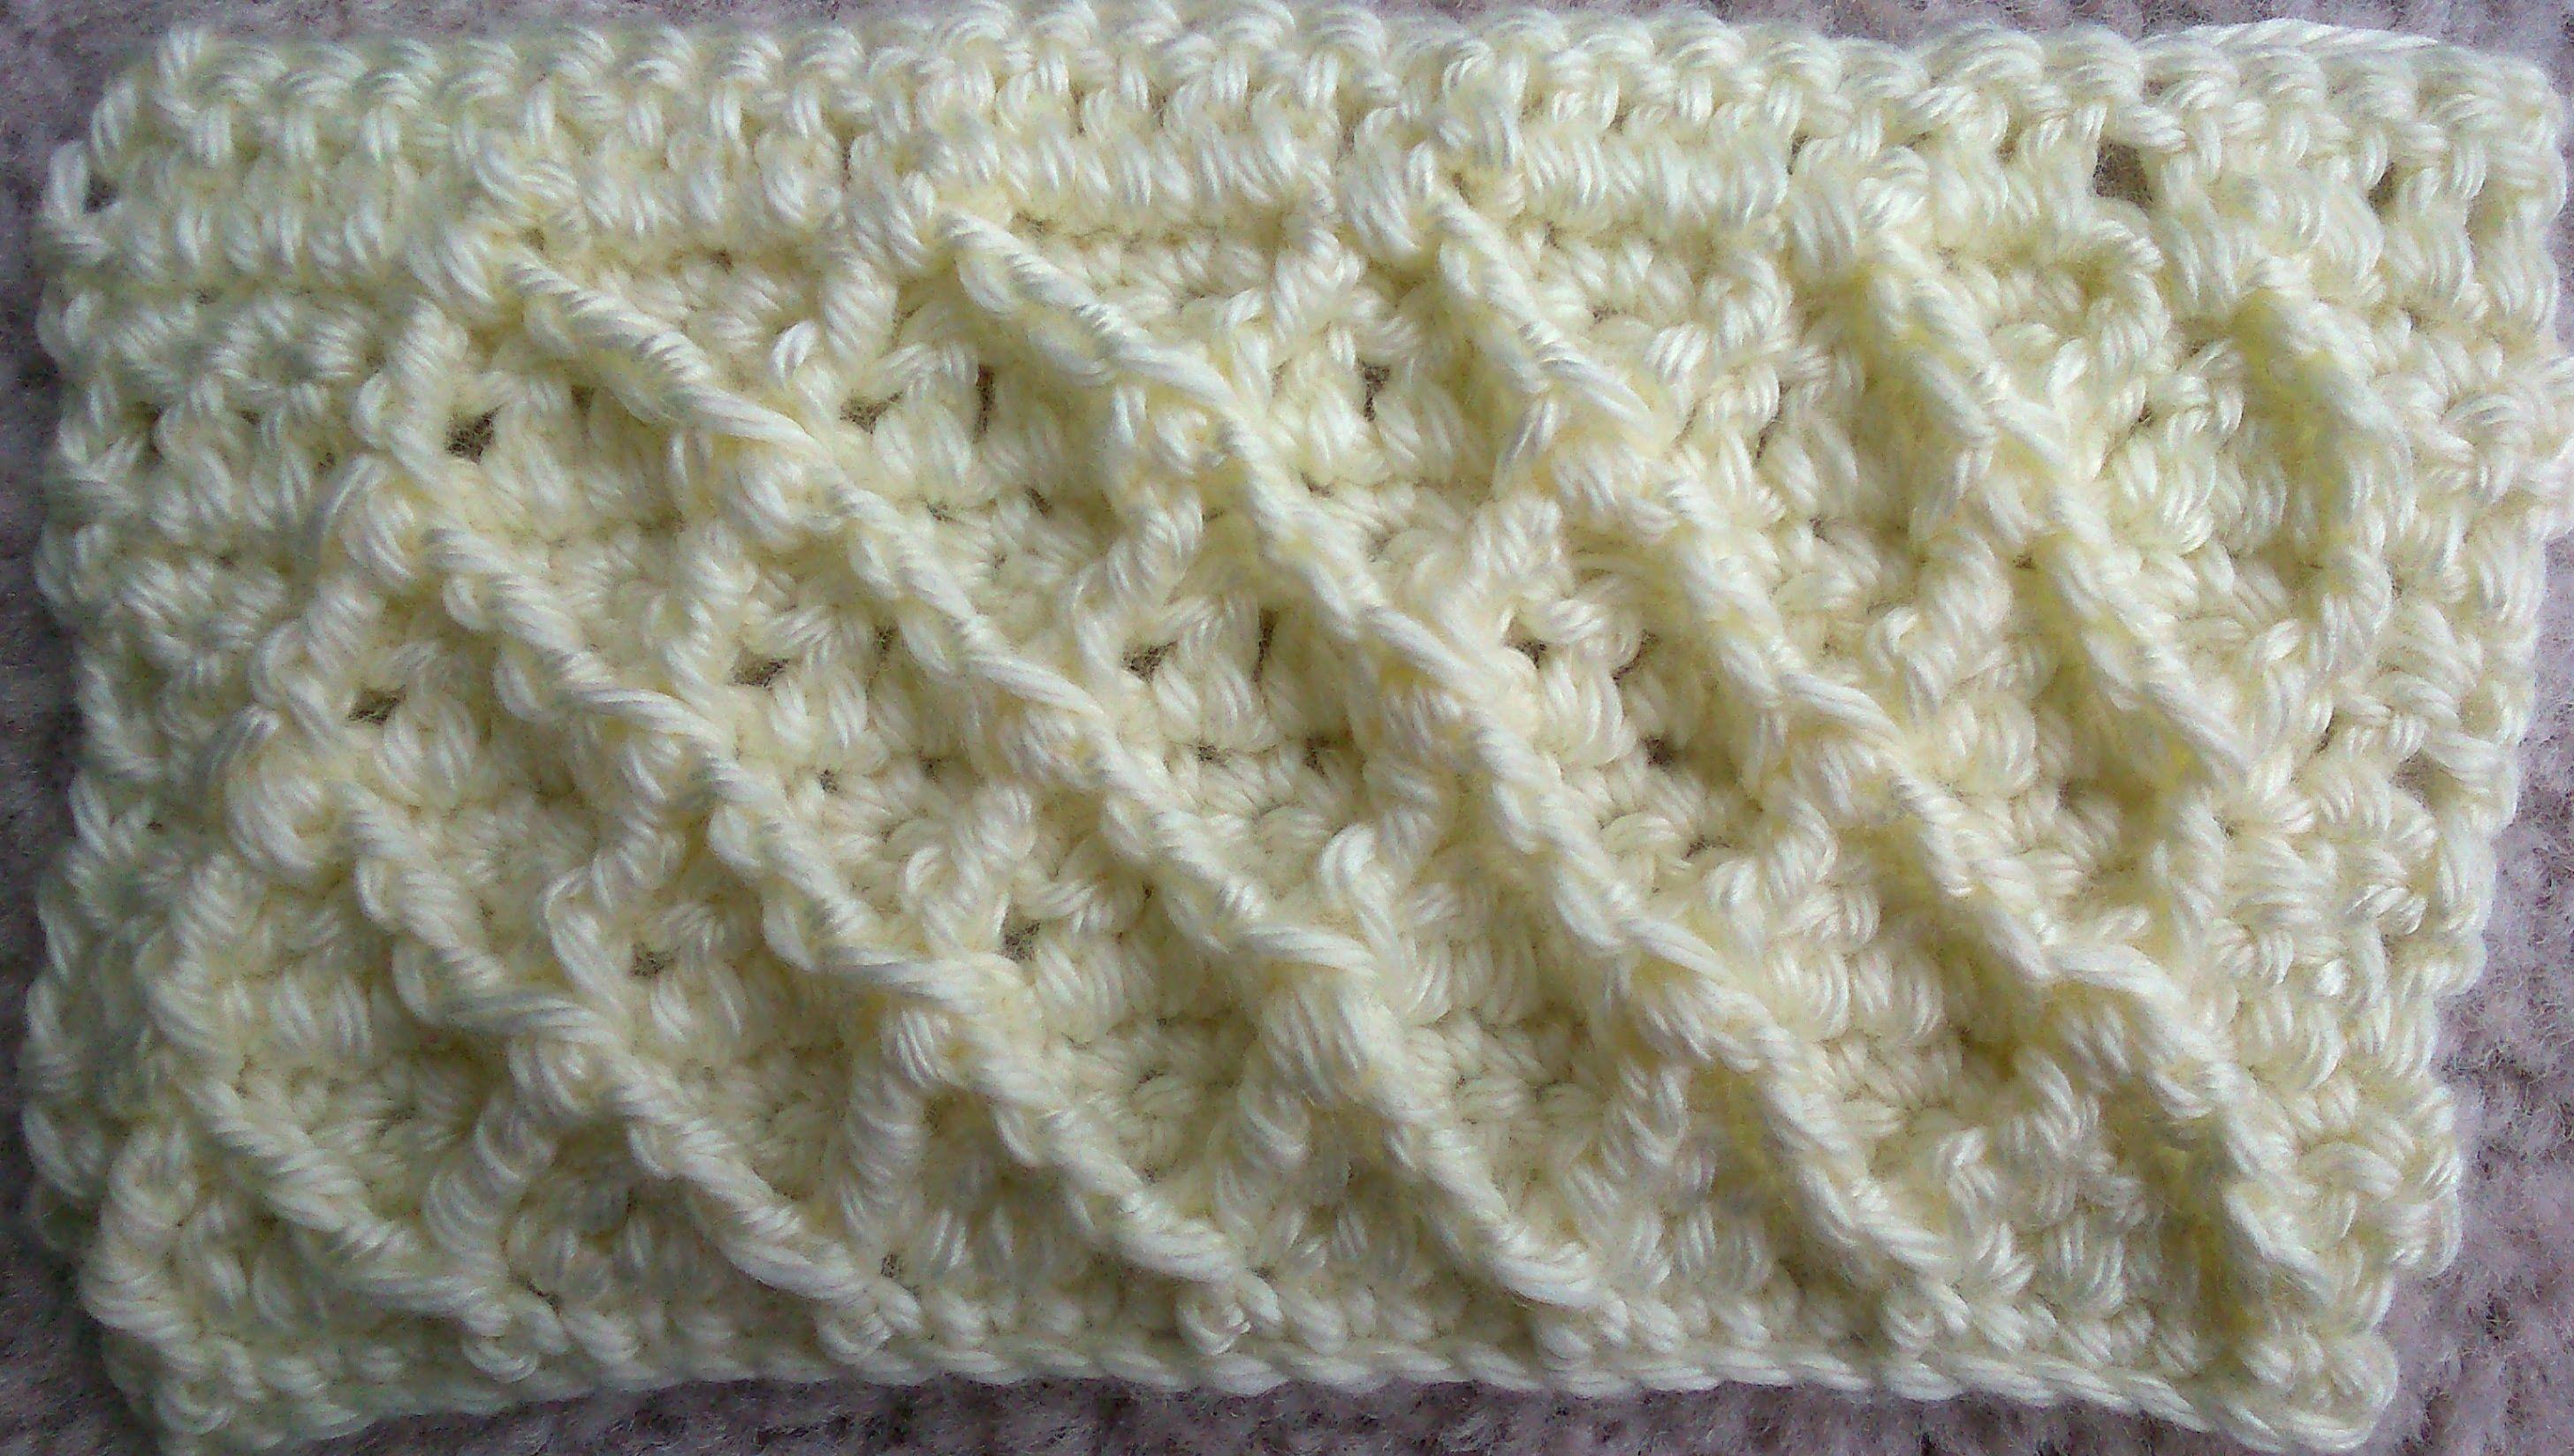 Crochet diamond checkers stitch pattern tutorial knitting and crochet diamond checkers stitch pattern tutorial bankloansurffo Choice Image